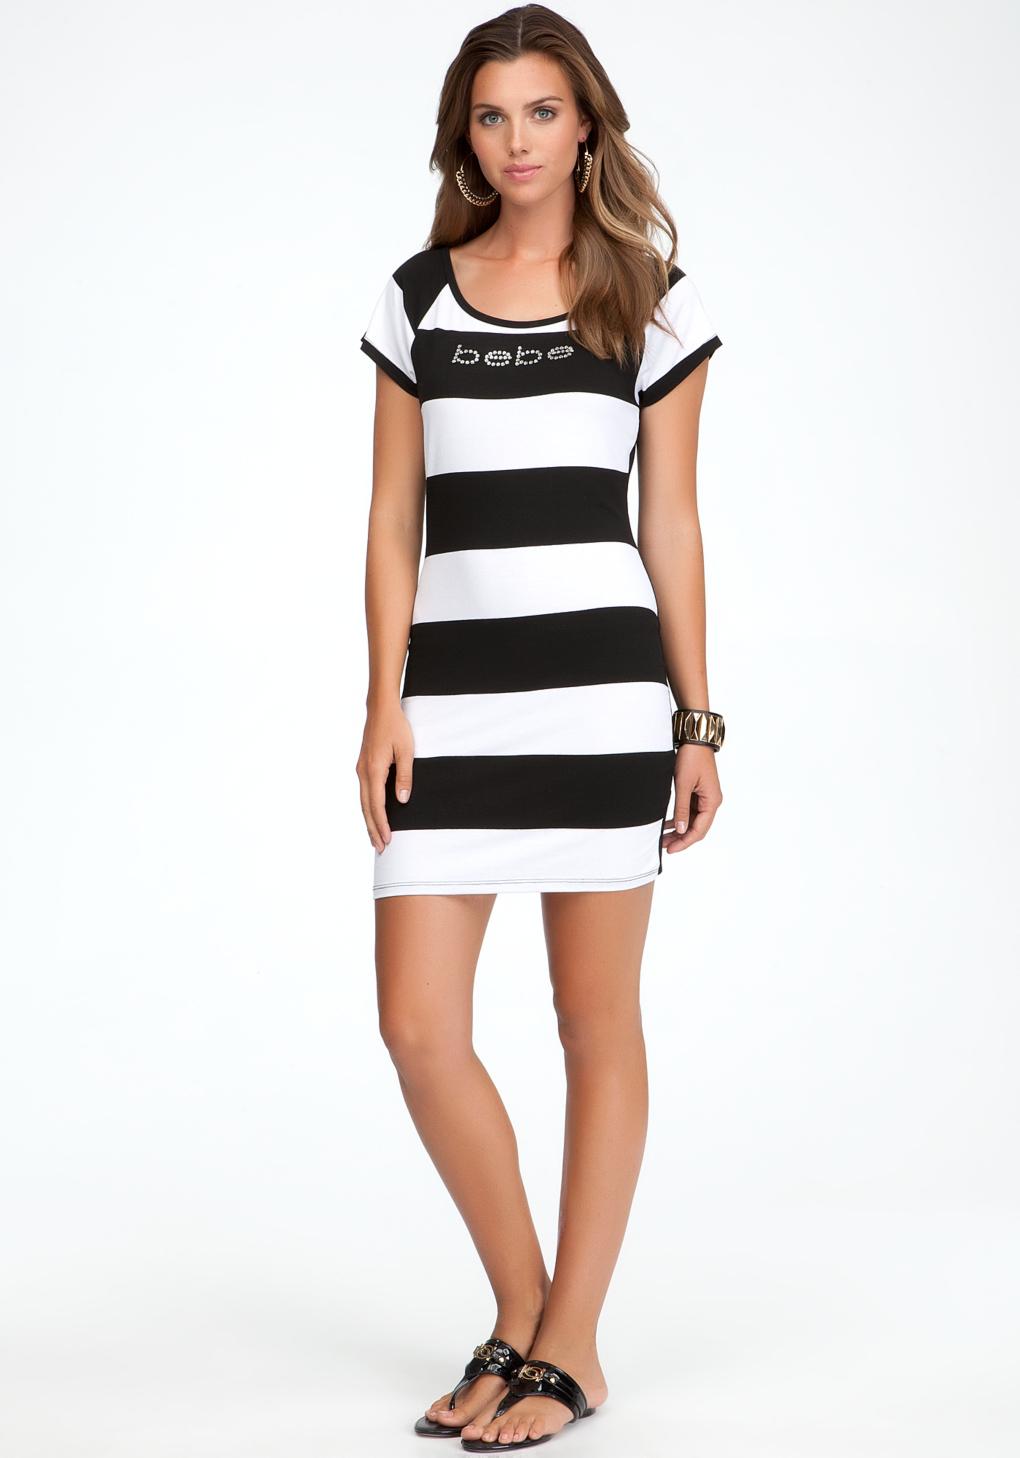 a46ebc081f Bebe Logo Rugby Stripe Tee Dress in White - Lyst